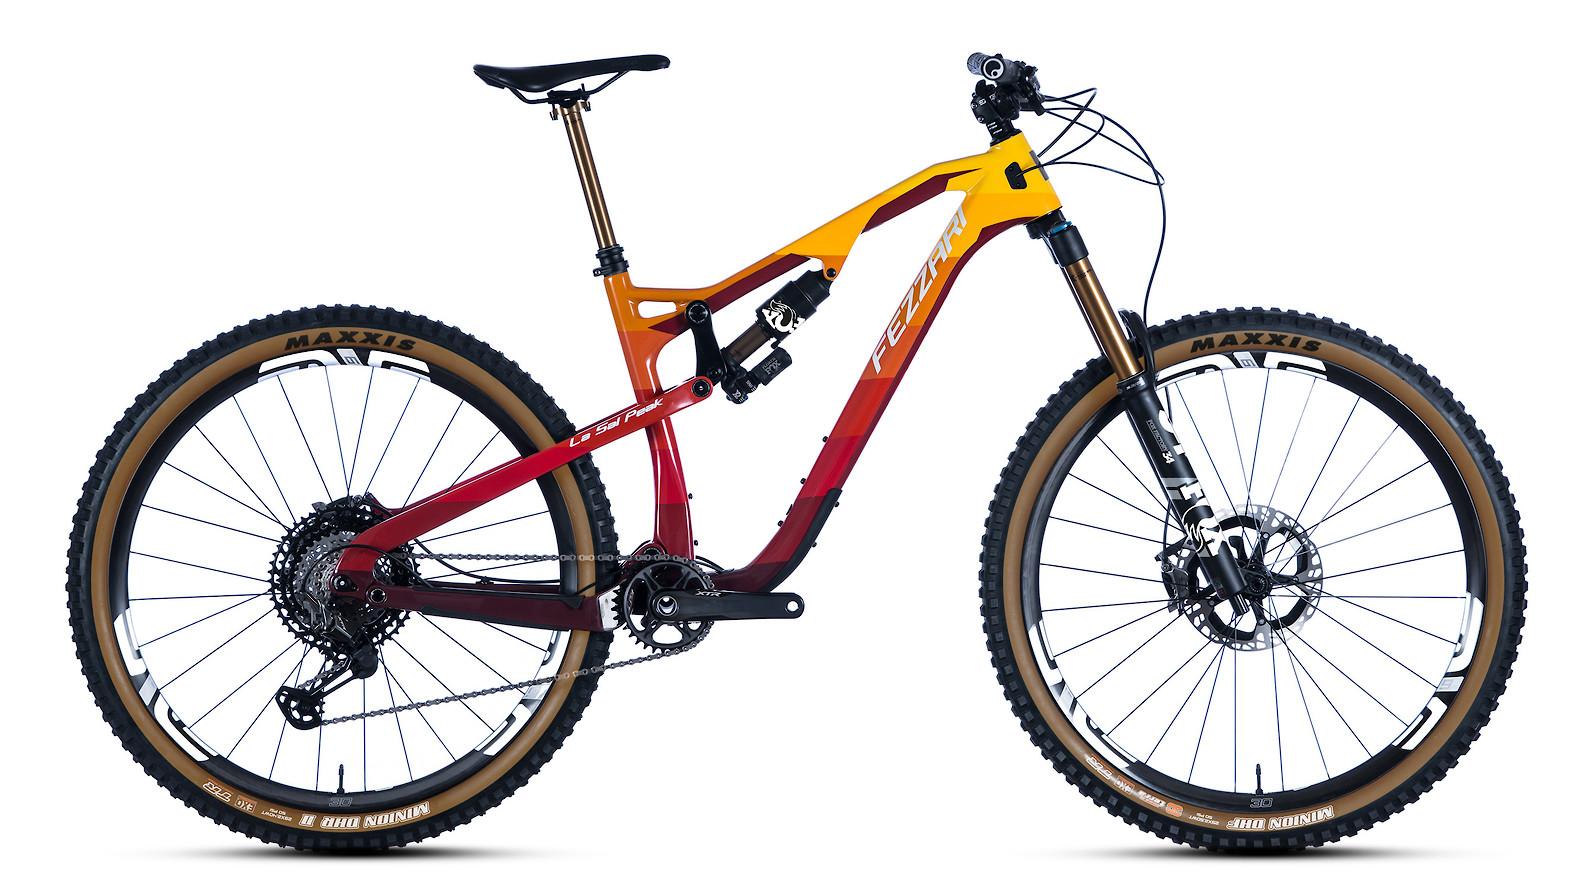 2020 Fezzari La Sal Peak City Edition (custom build shown)